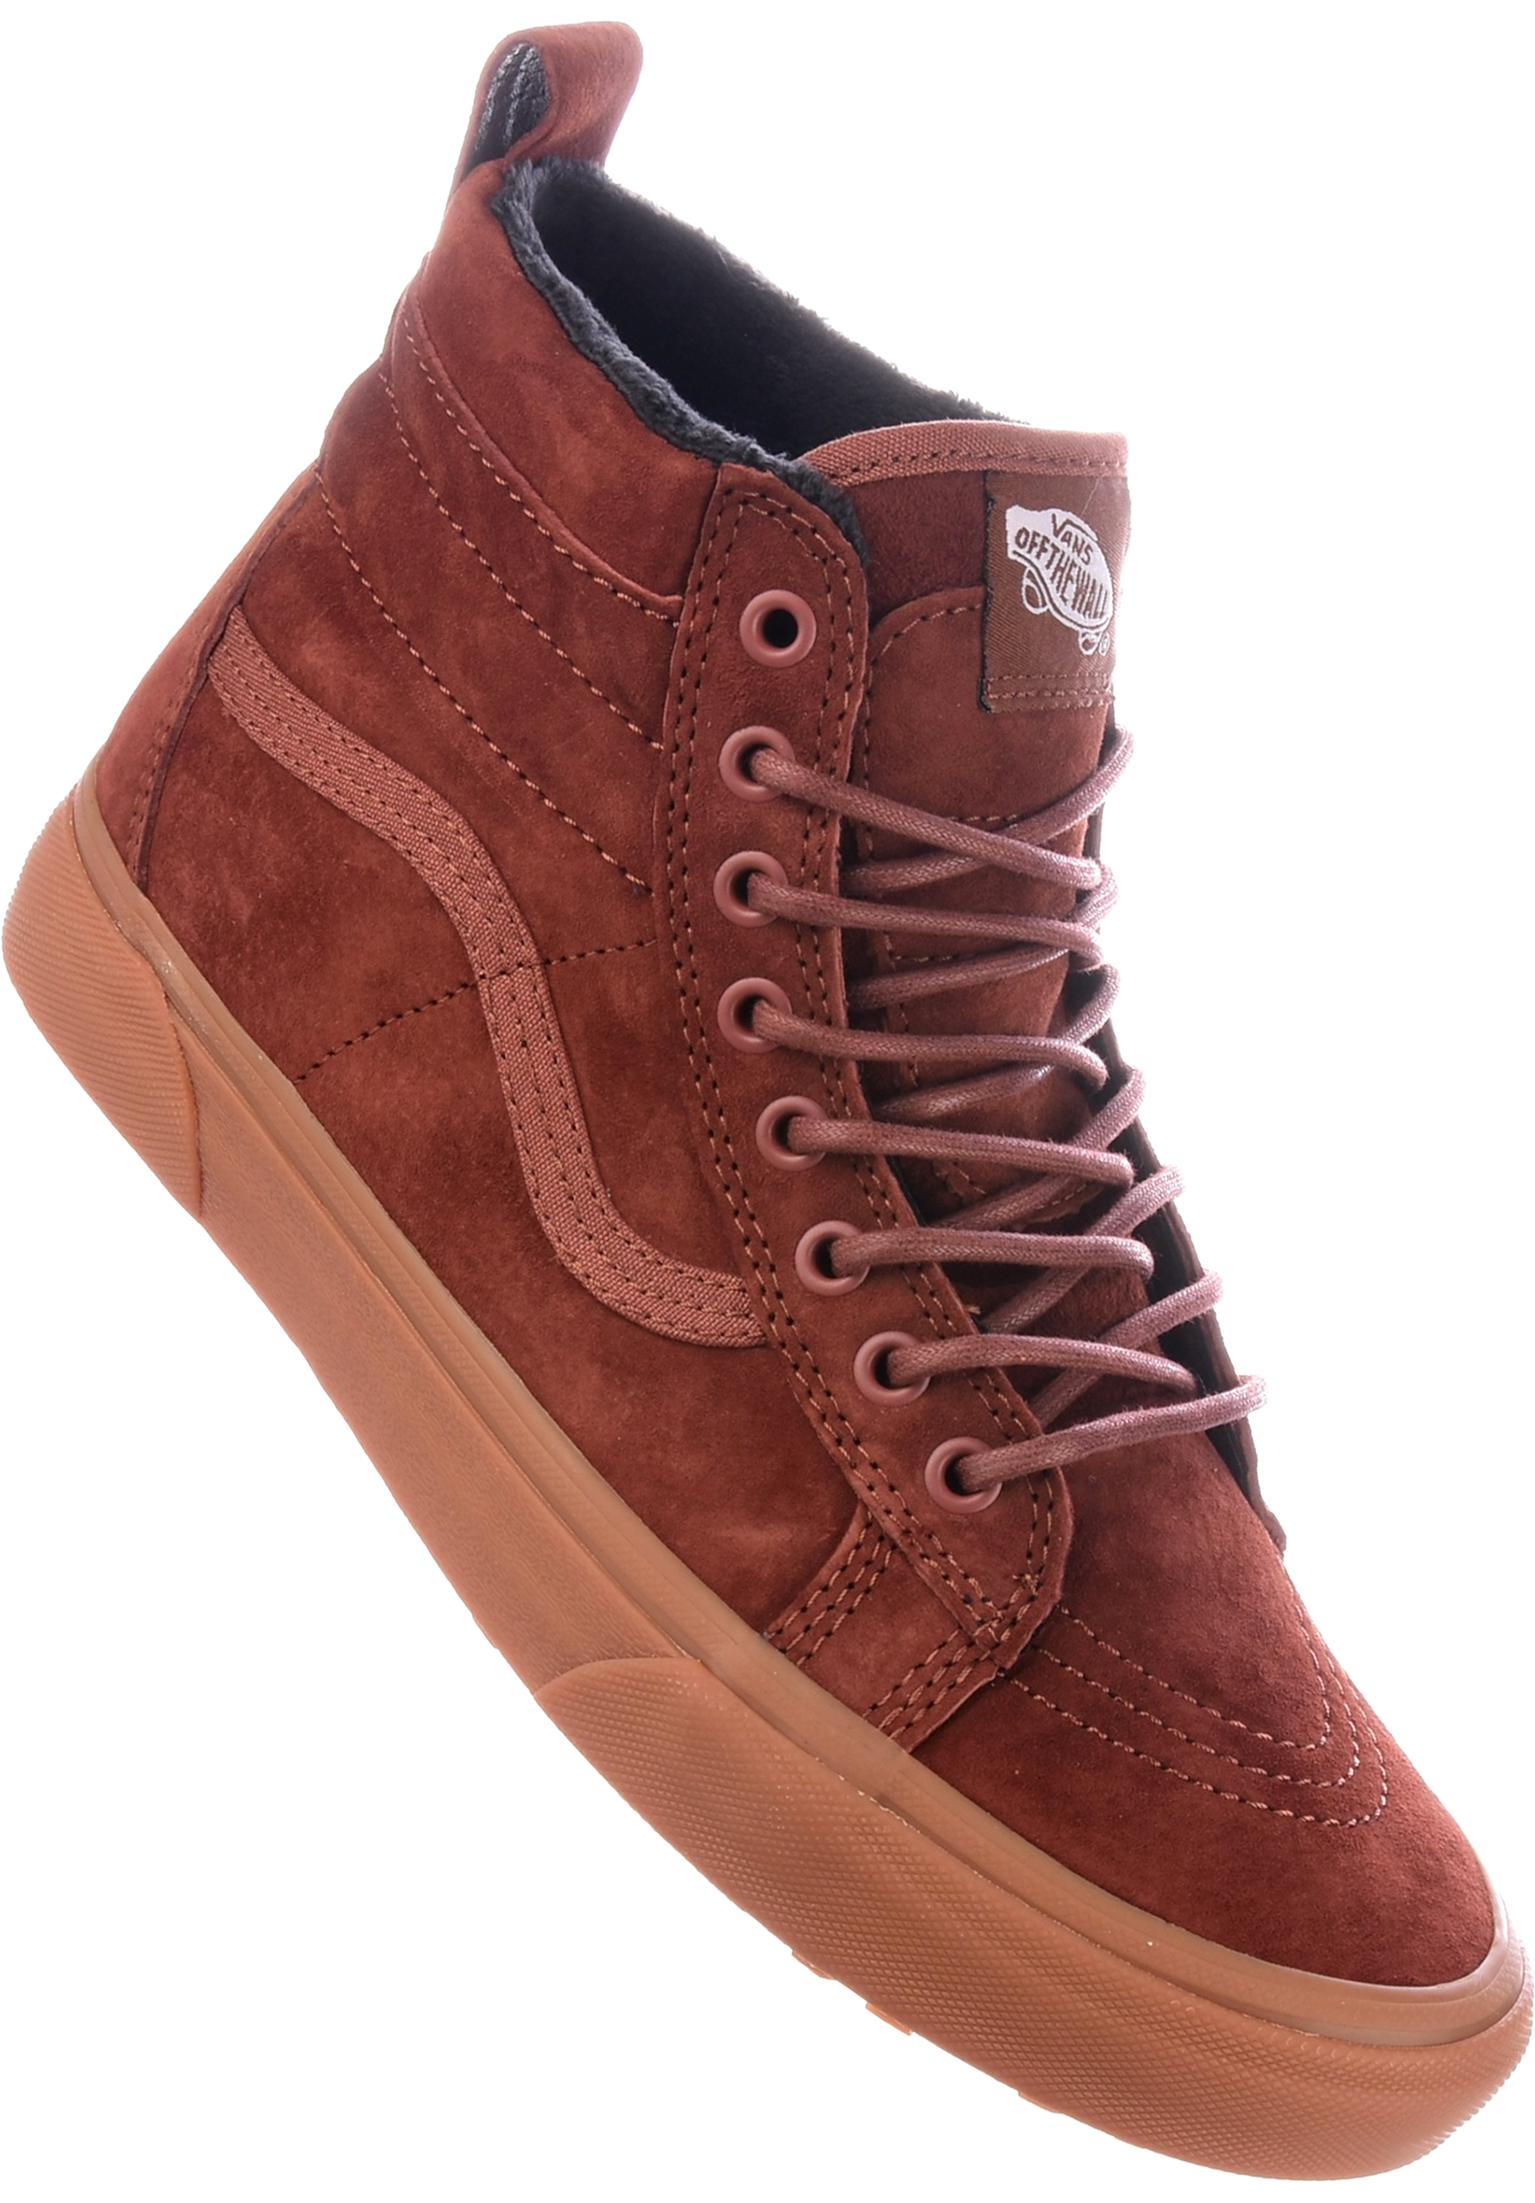 52ba783e09 Sk8 Hi MTE Vans All Shoes in sequoia-gum for Men